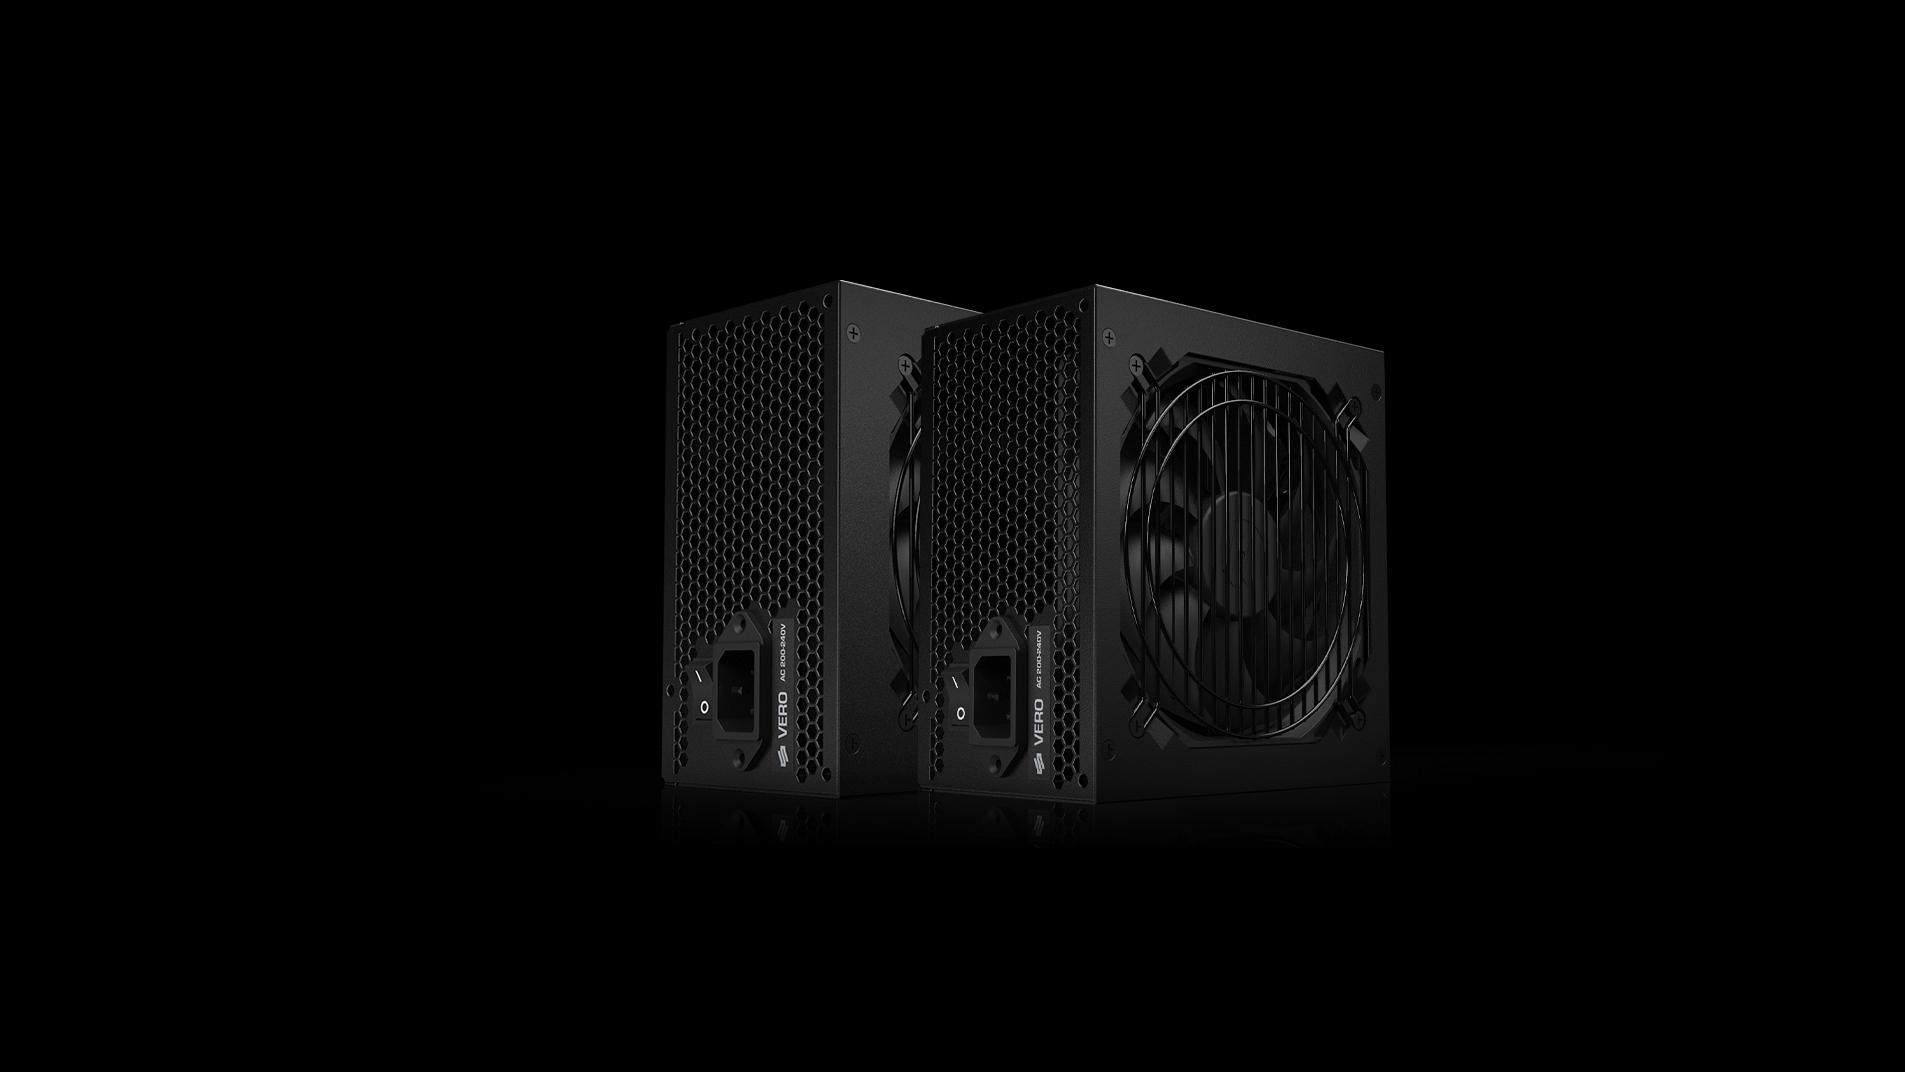 Zasilacze Vero L3 / M3 o mocy 500 - 700 W<br /></noscript>